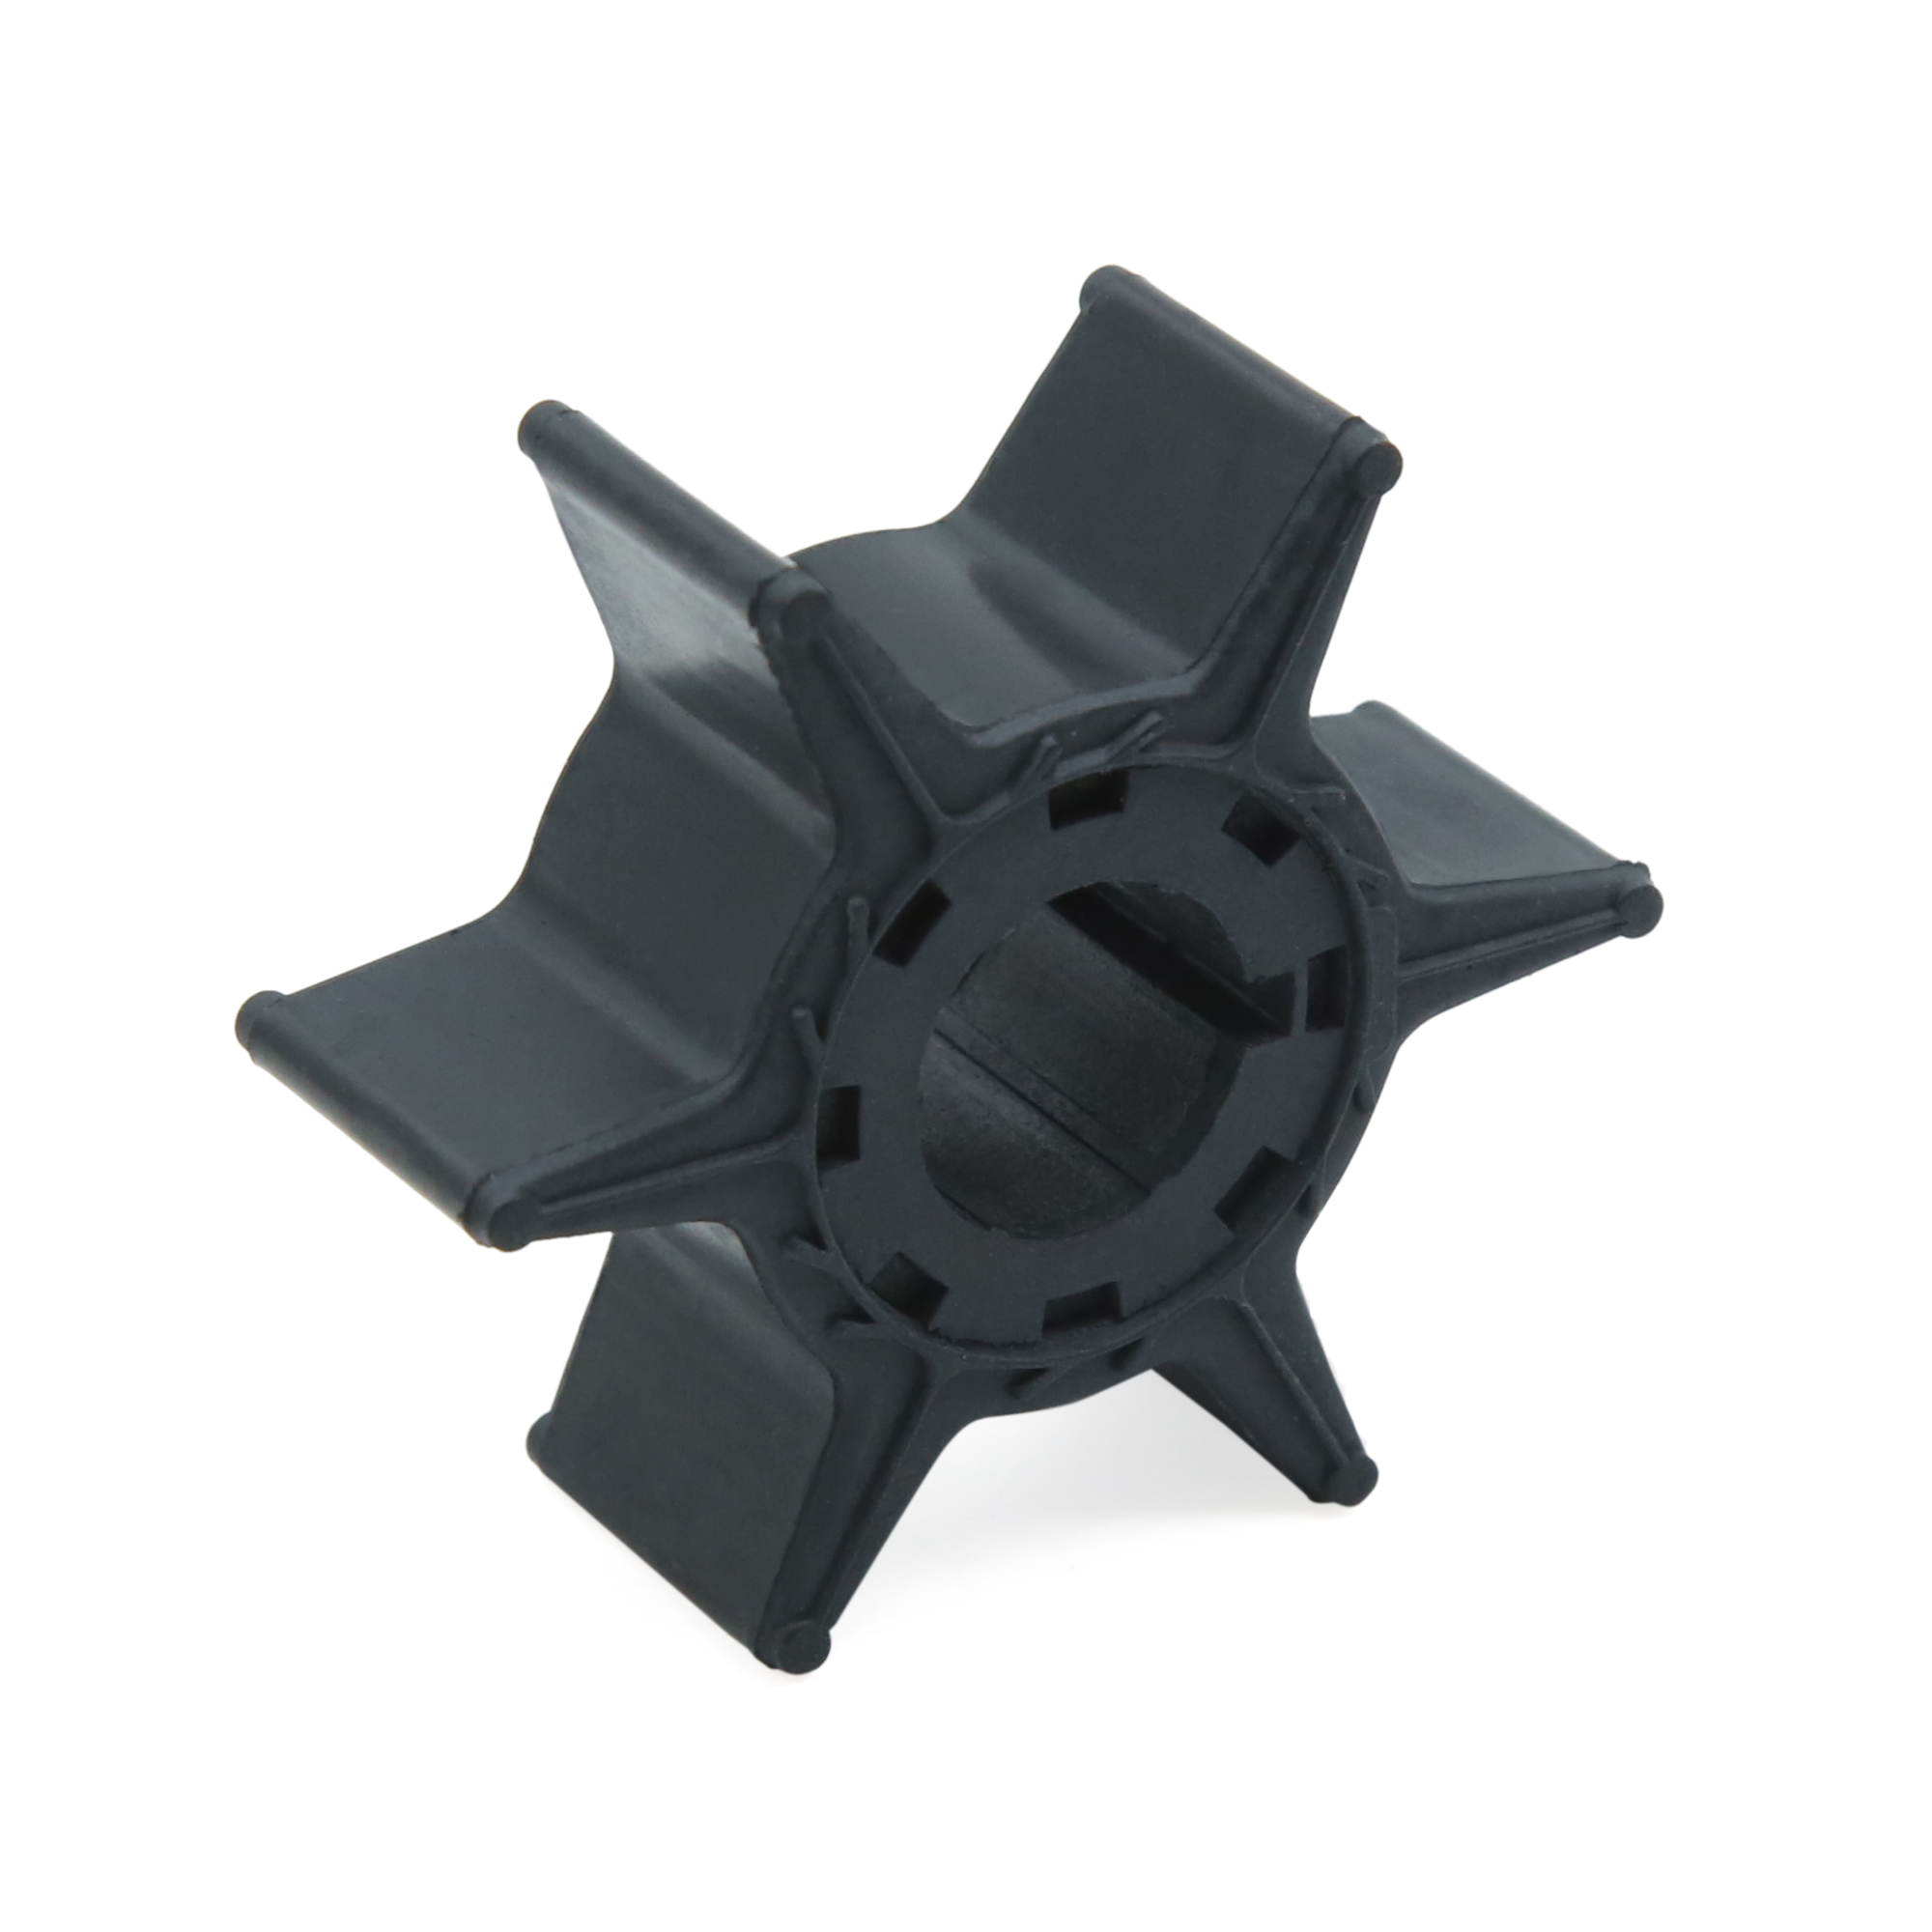 Black Boat Outboard Water Pump Impeller for Yamaha 20 25hp 6L2-44352-00-00 - image 5 de 5